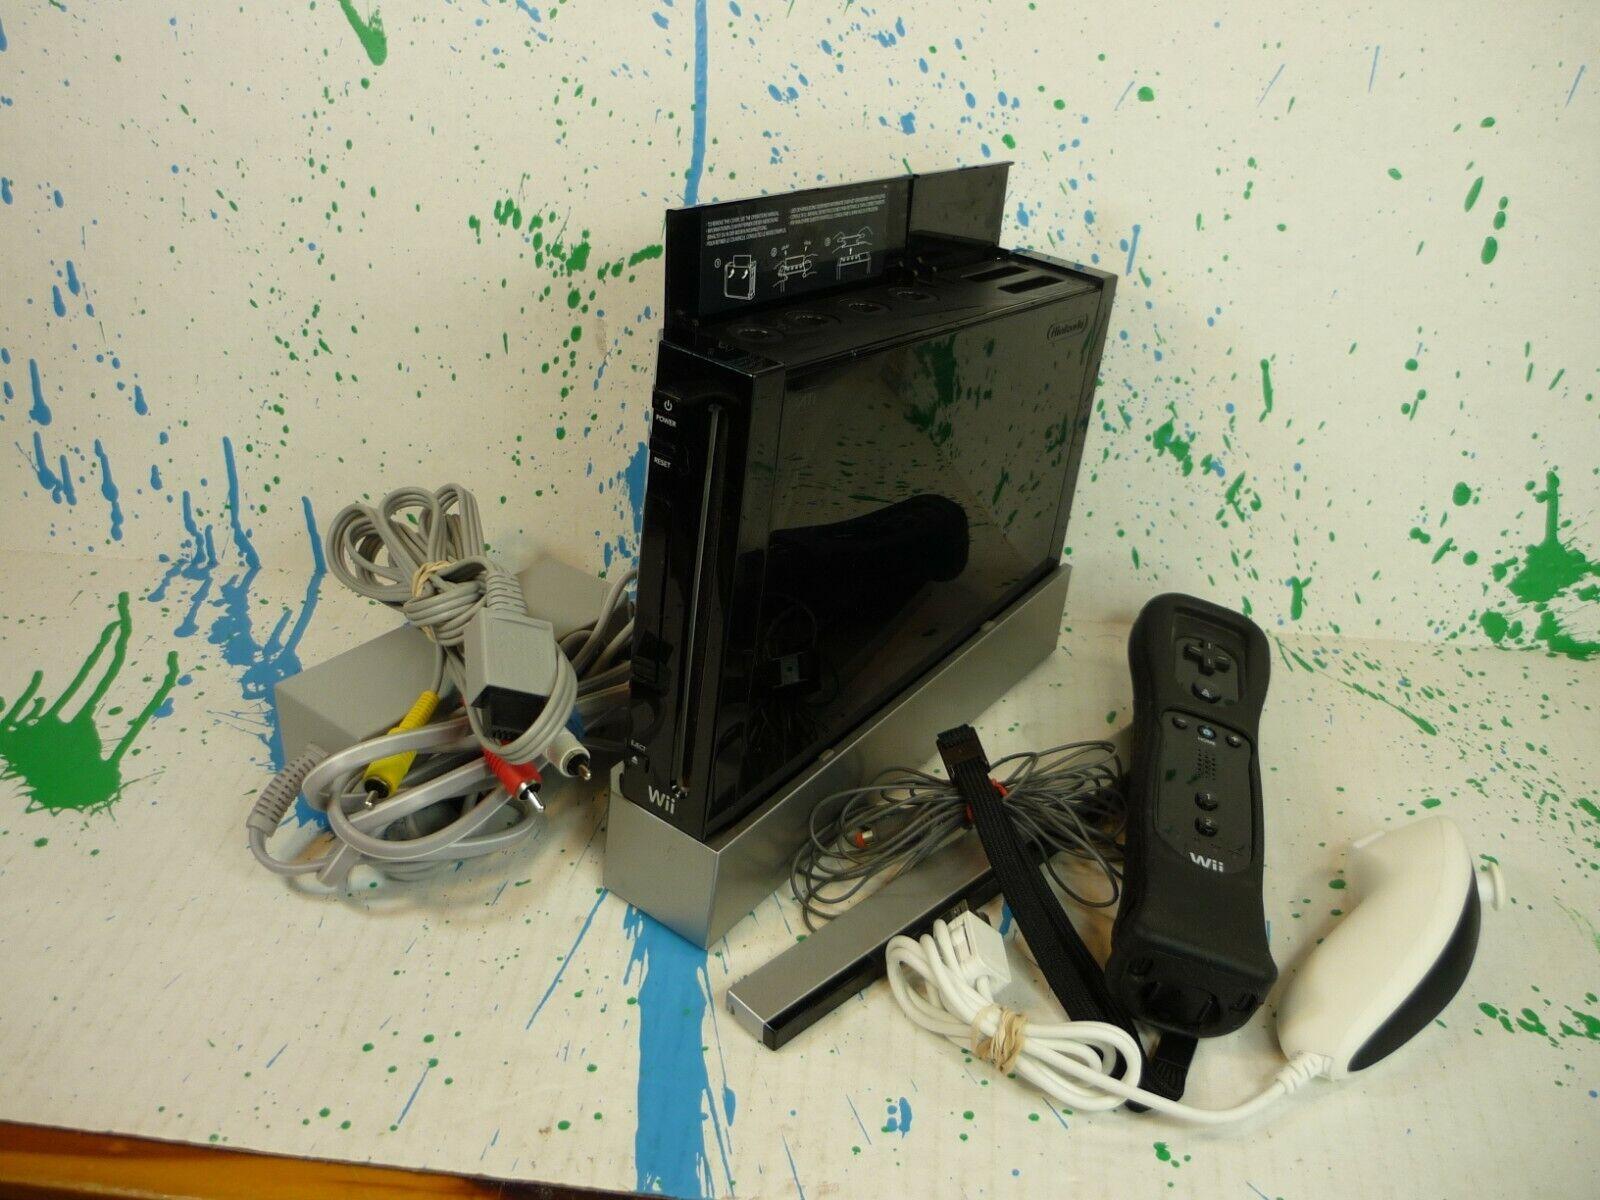 Nintendo Wii Console Bundle RVL-001-Black-Gamecube Compatible